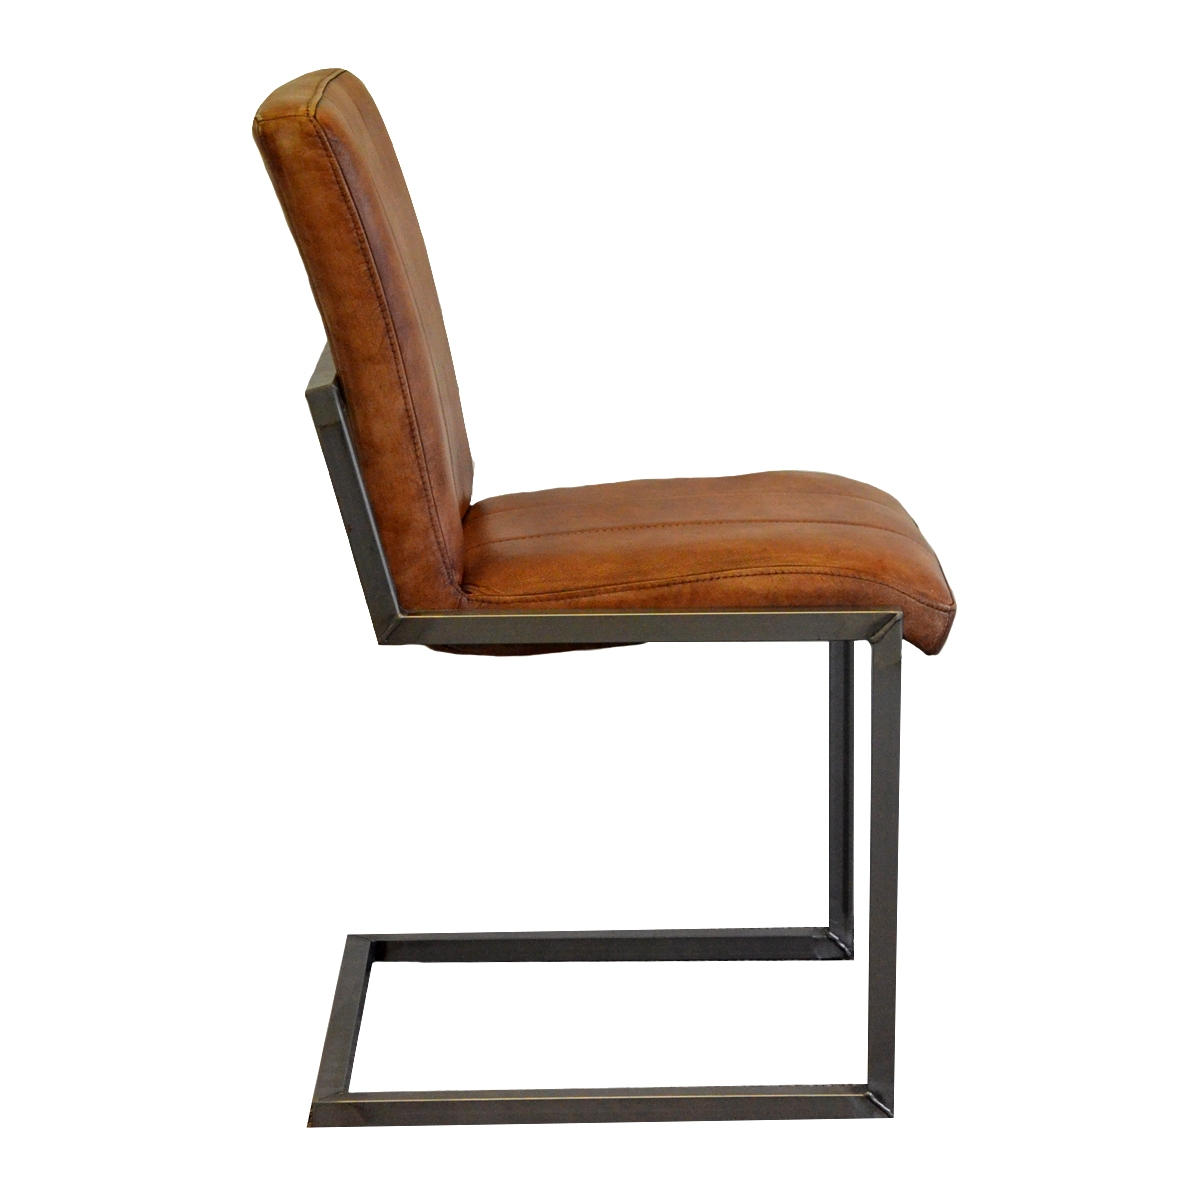 freischwinger cooper aus echtem b ffelleder livior. Black Bedroom Furniture Sets. Home Design Ideas